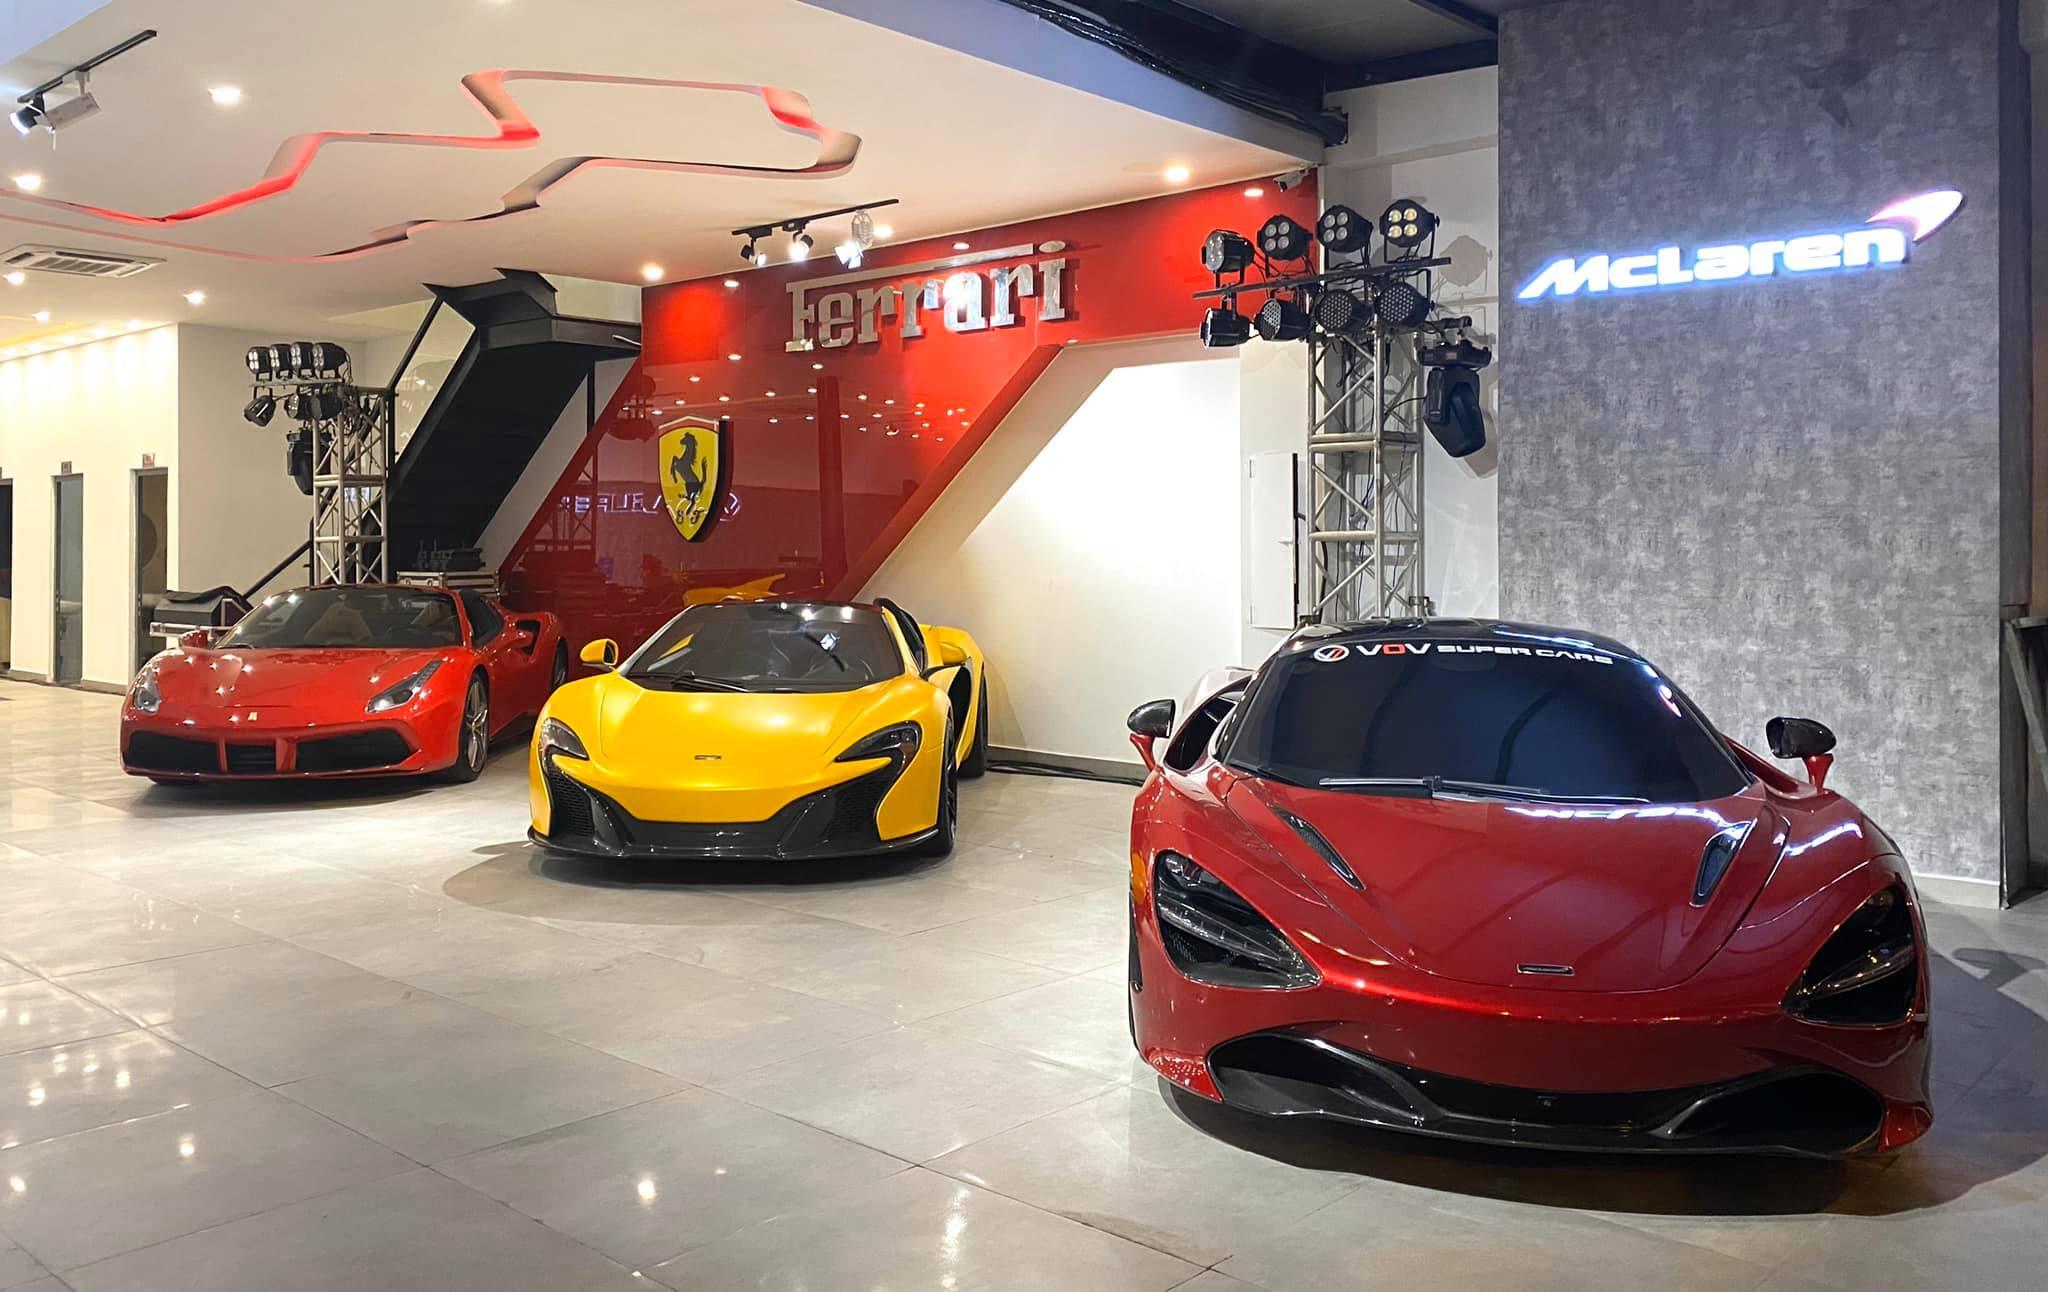 showroom-sieu-xe-80732238-1042919699392461-5395778258757222400-o.jpg